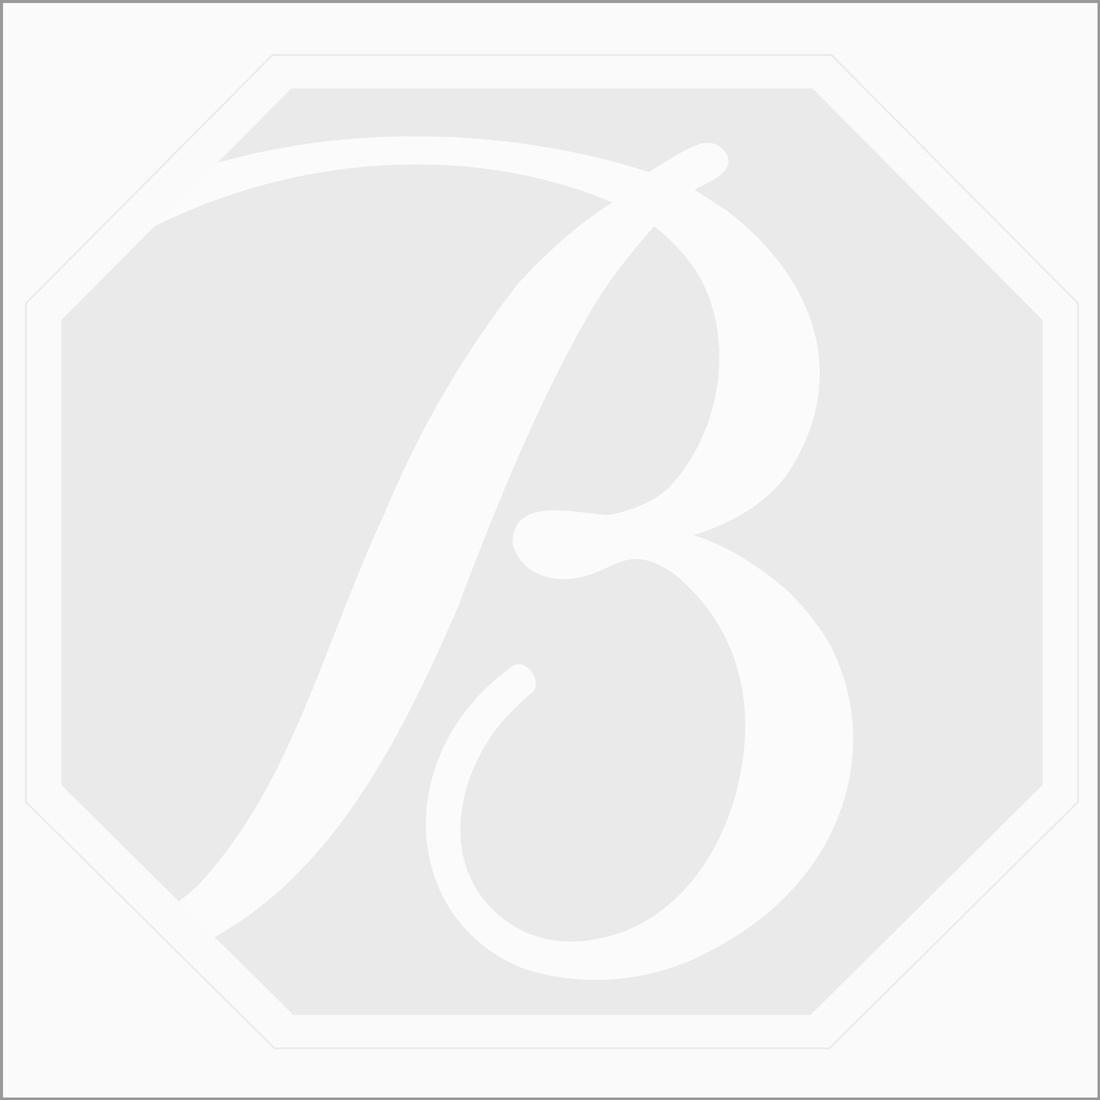 2 Black Diamond Cushion Shape Rose Cut Diamonds - 3.33 cts. (DRC1260)